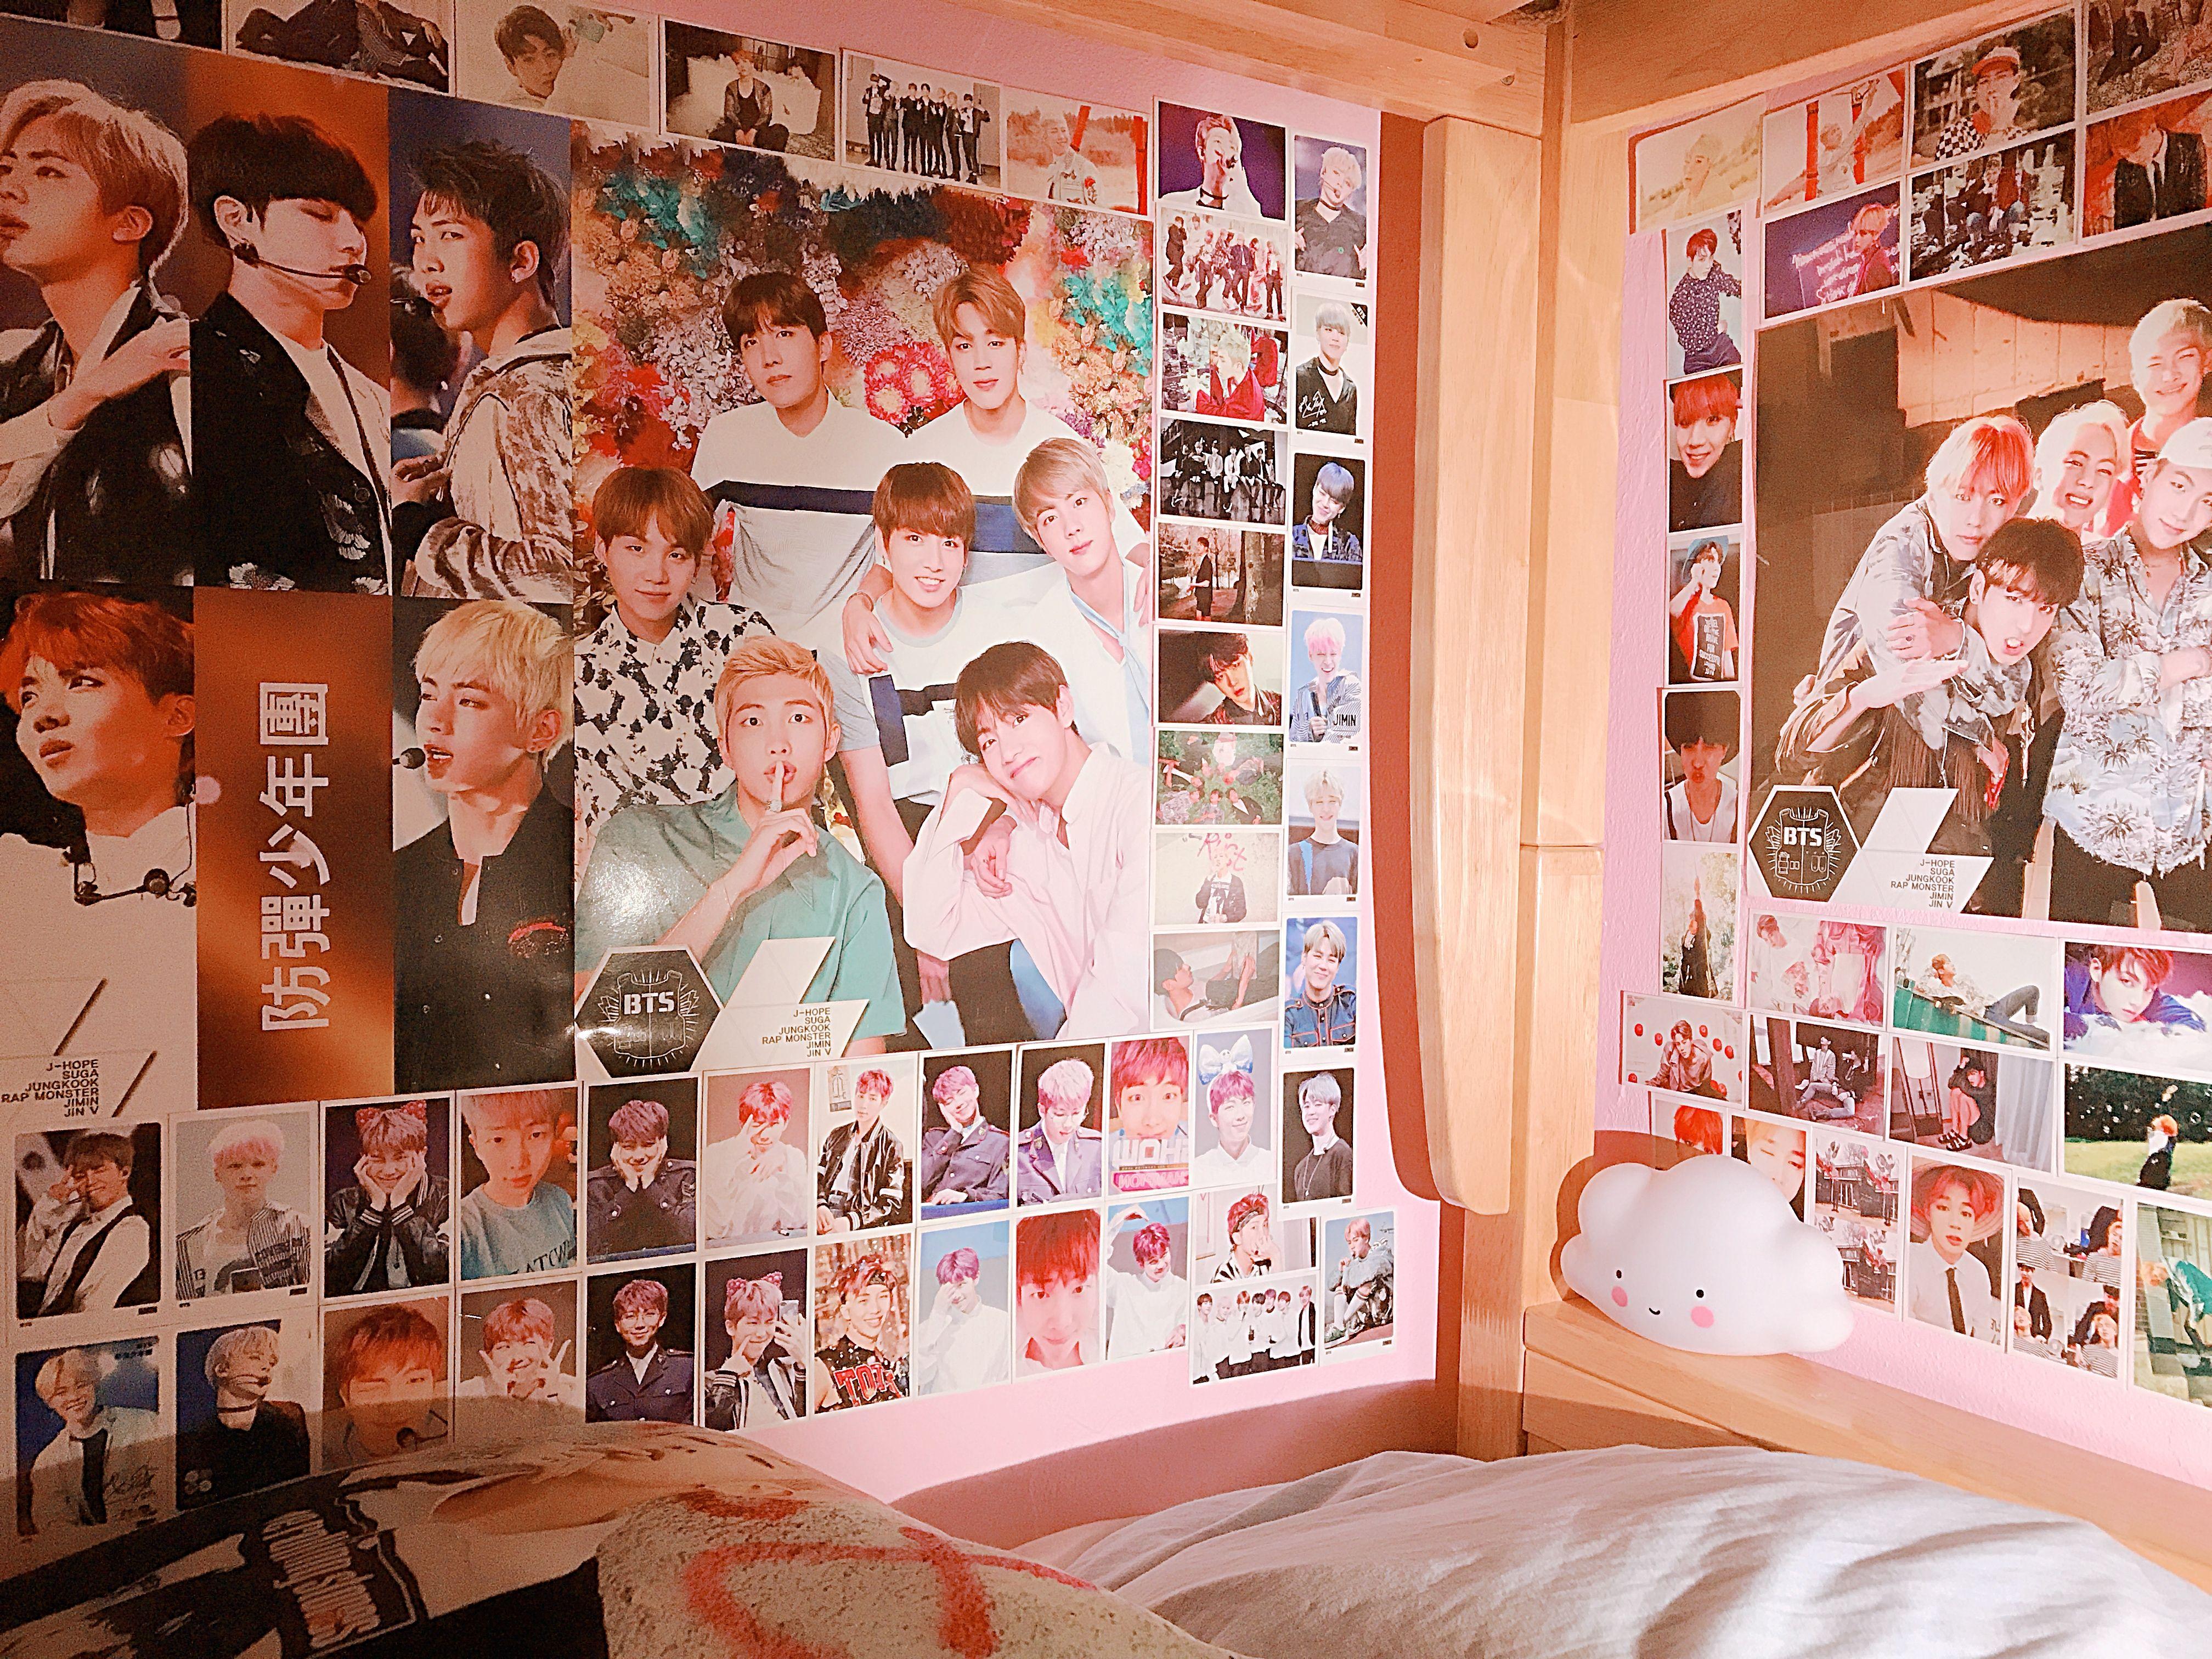 UPHOIA save me   mood  Room Decor Army room decor Army room